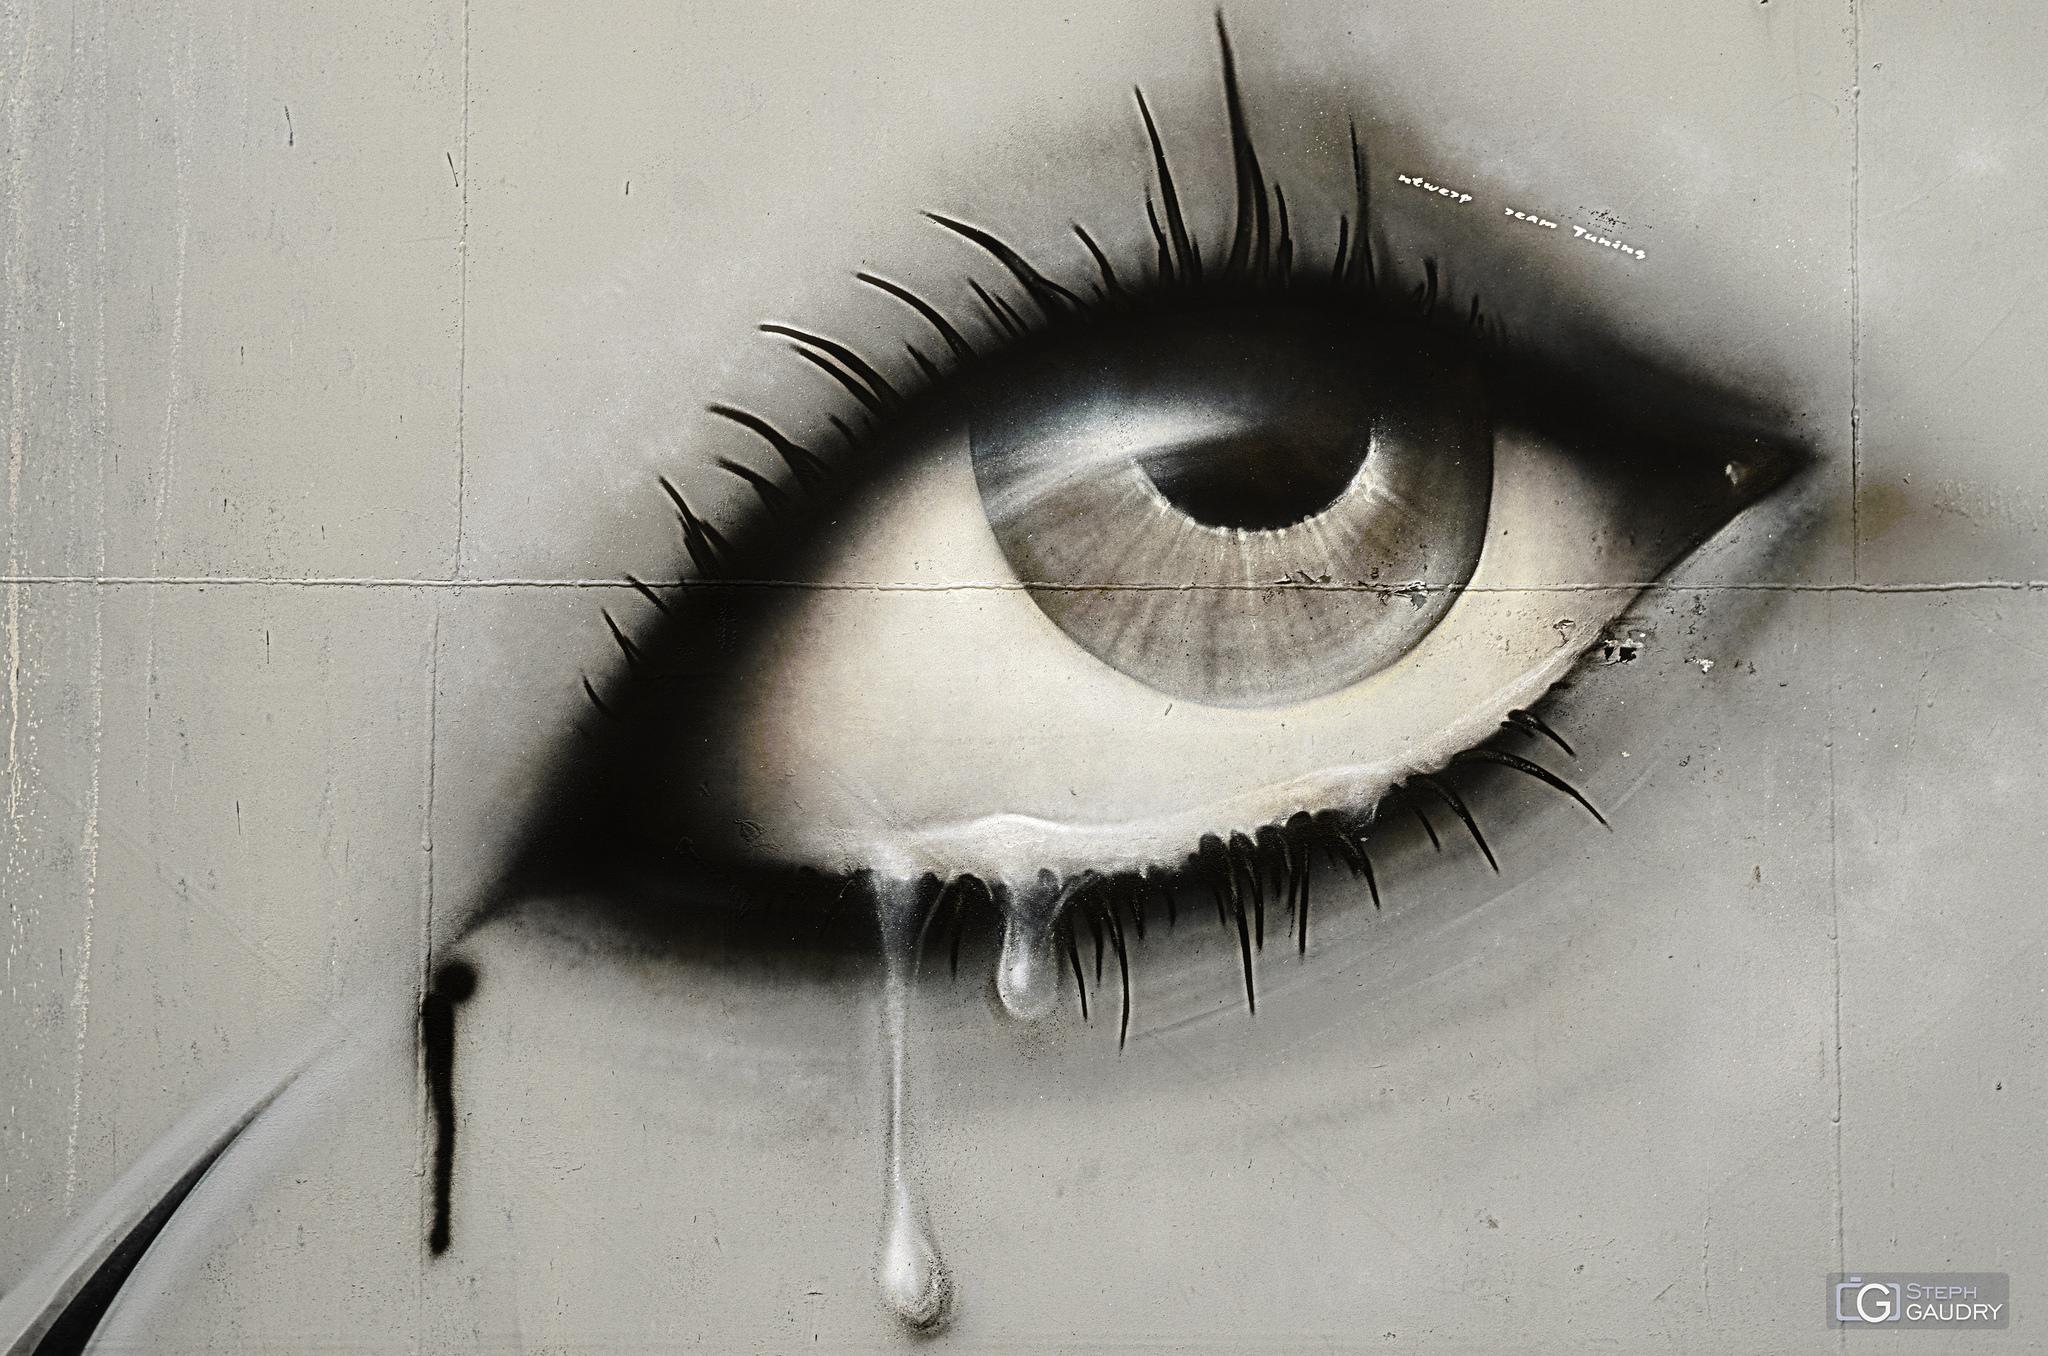 Les larmes de Doel - Gros plan [Klik om de diavoorstelling te starten]